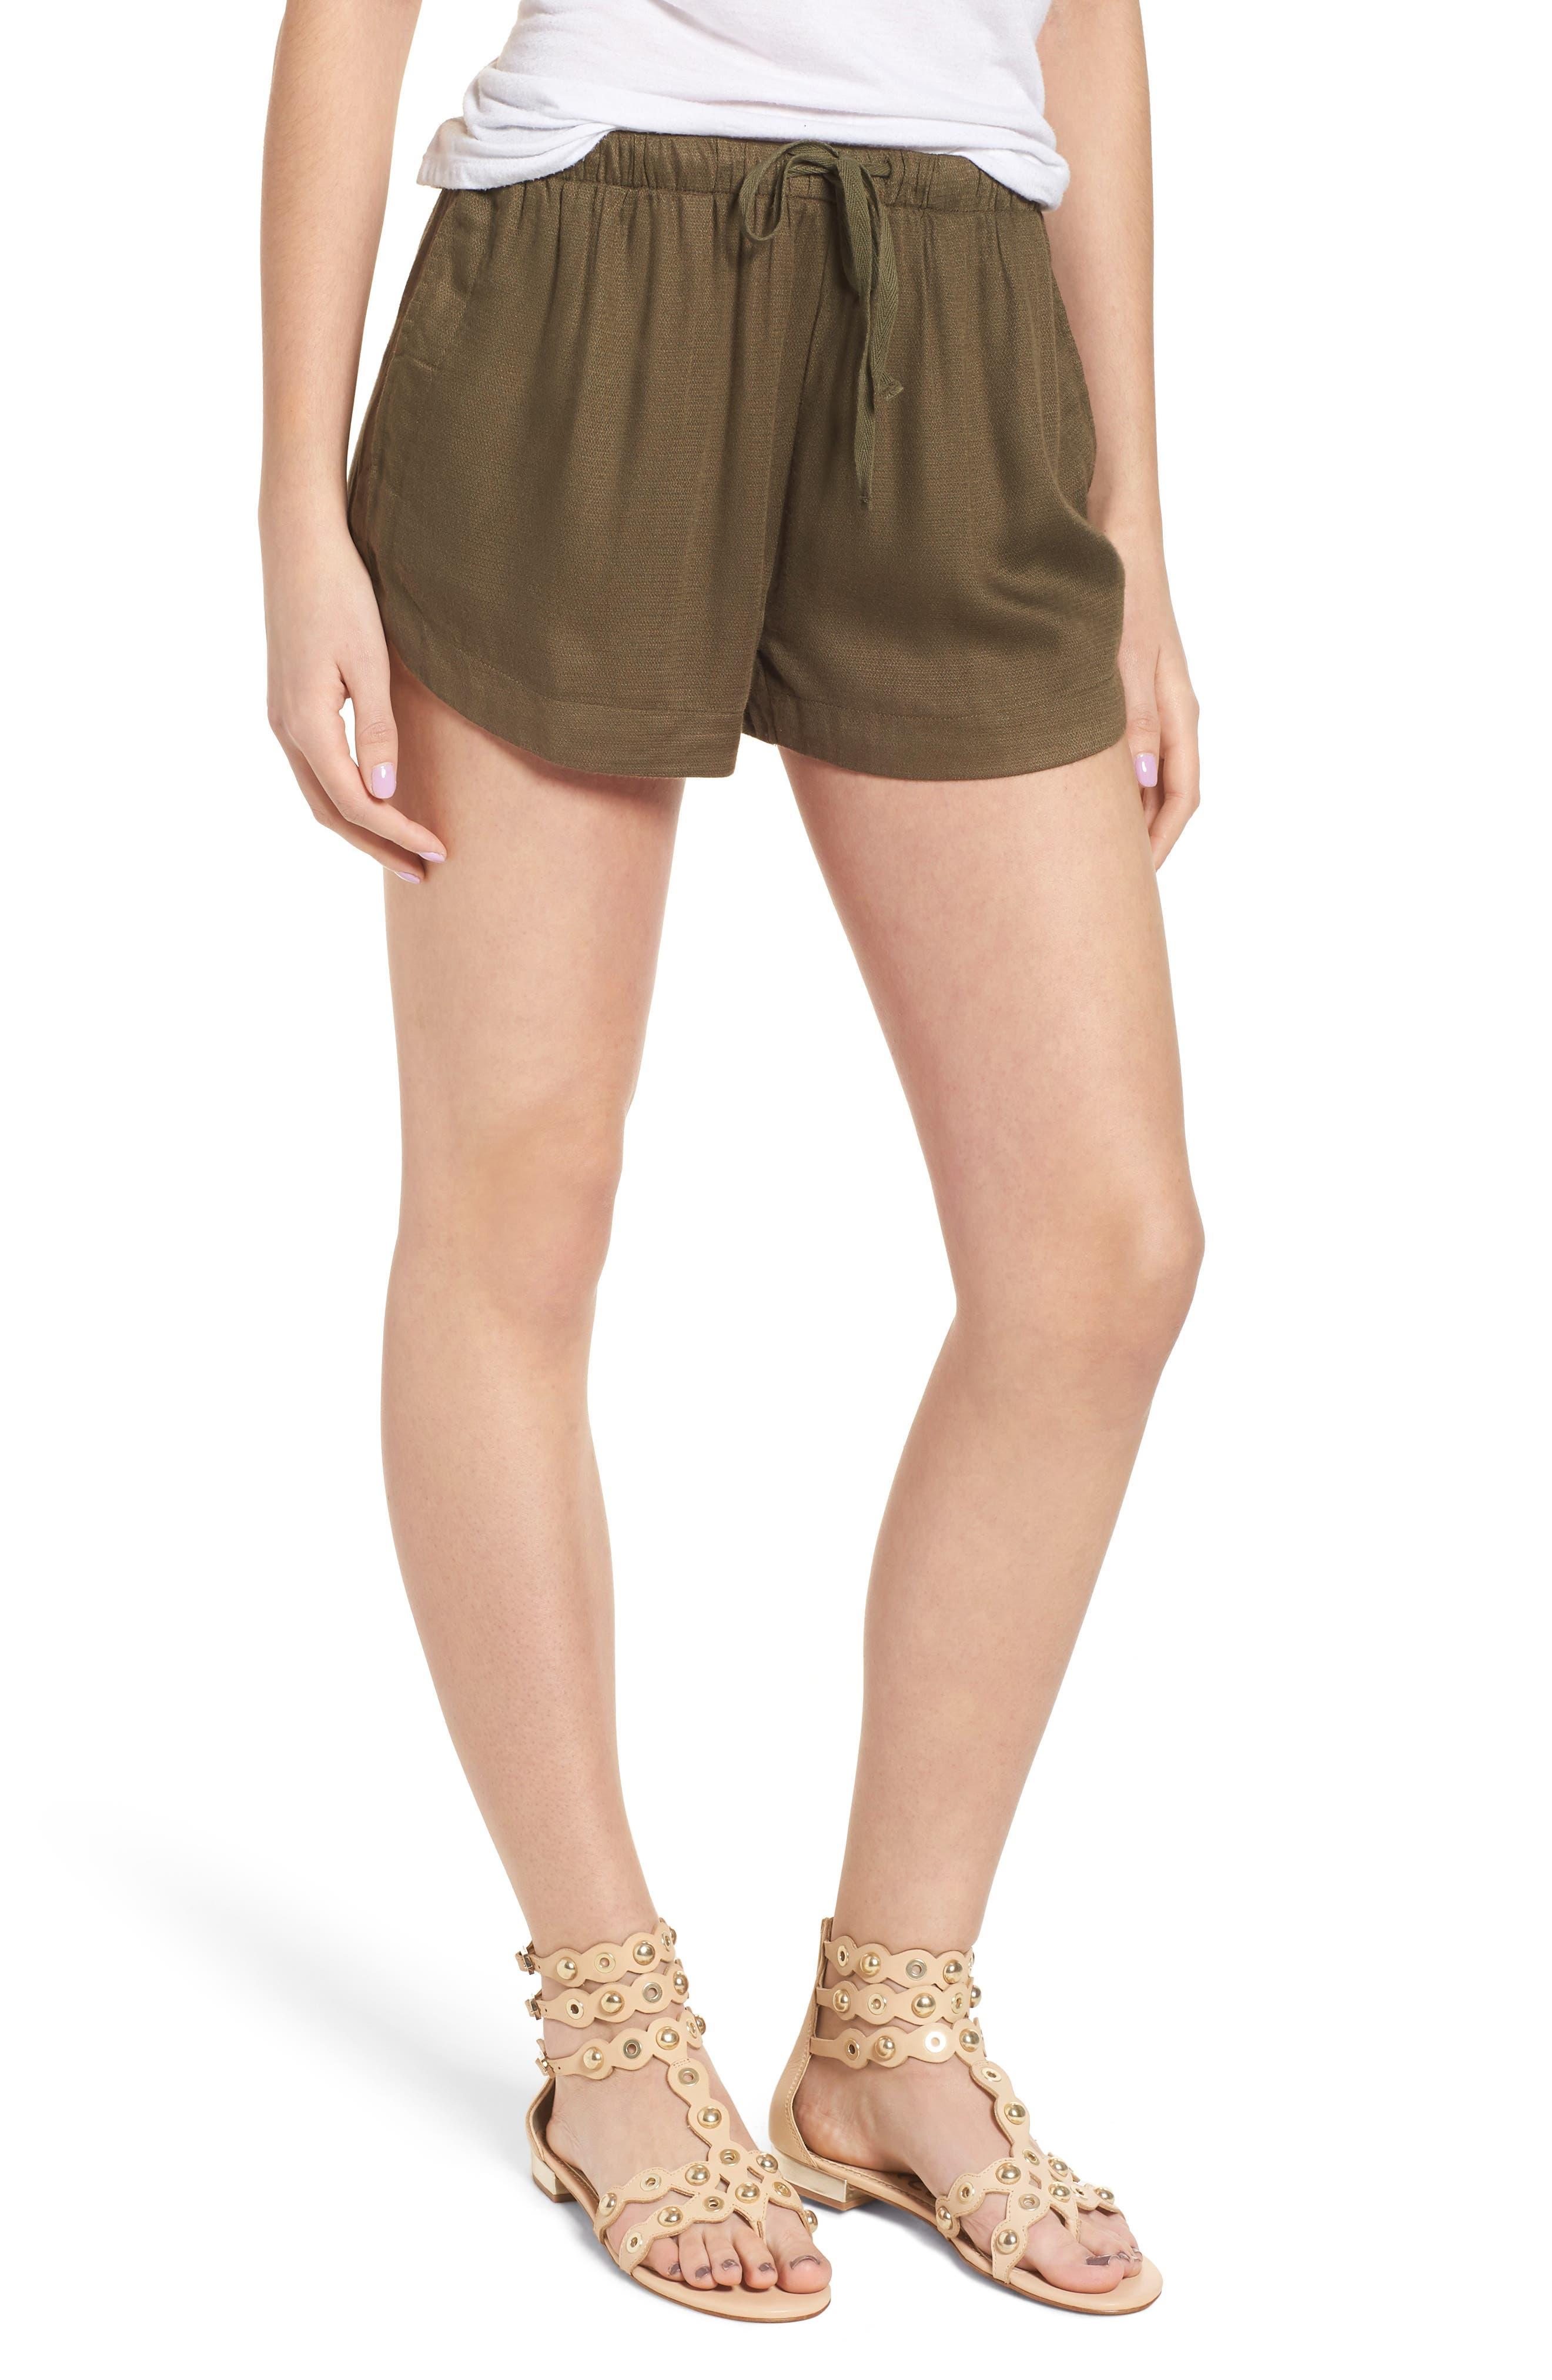 Vary Yume Shorts,                         Main,                         color, Burnt Olive